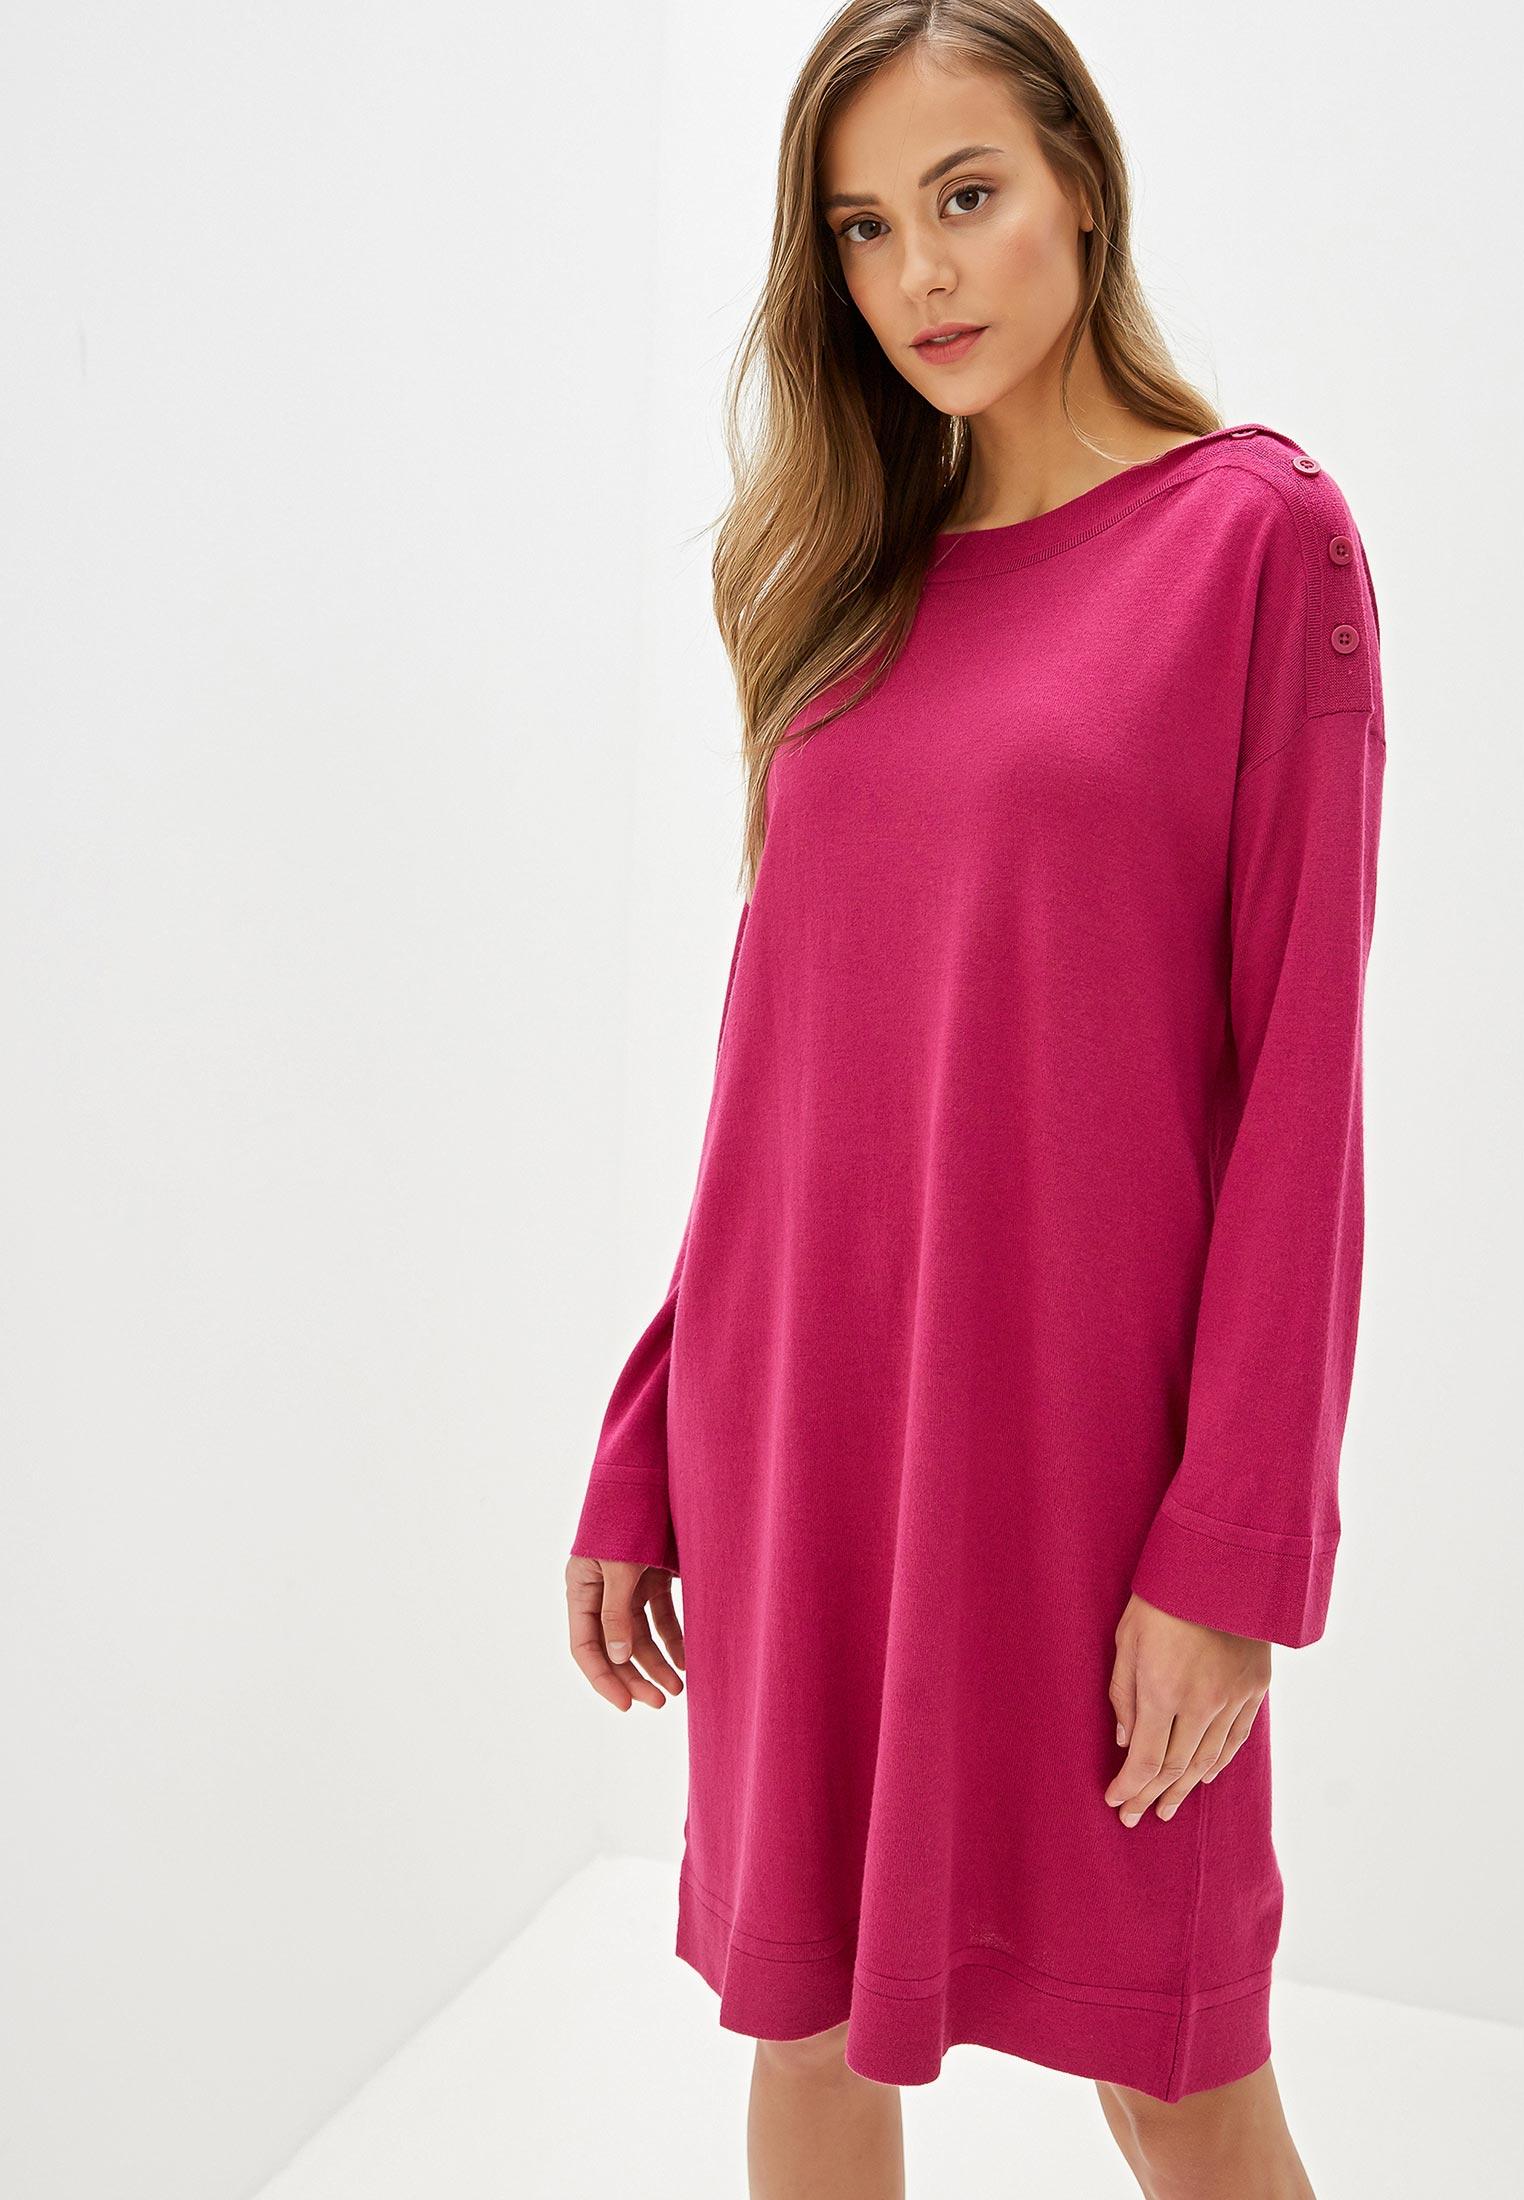 Вязаное платье United Colors of Benetton (Юнайтед Колорс оф Бенеттон) 12GLV1J29